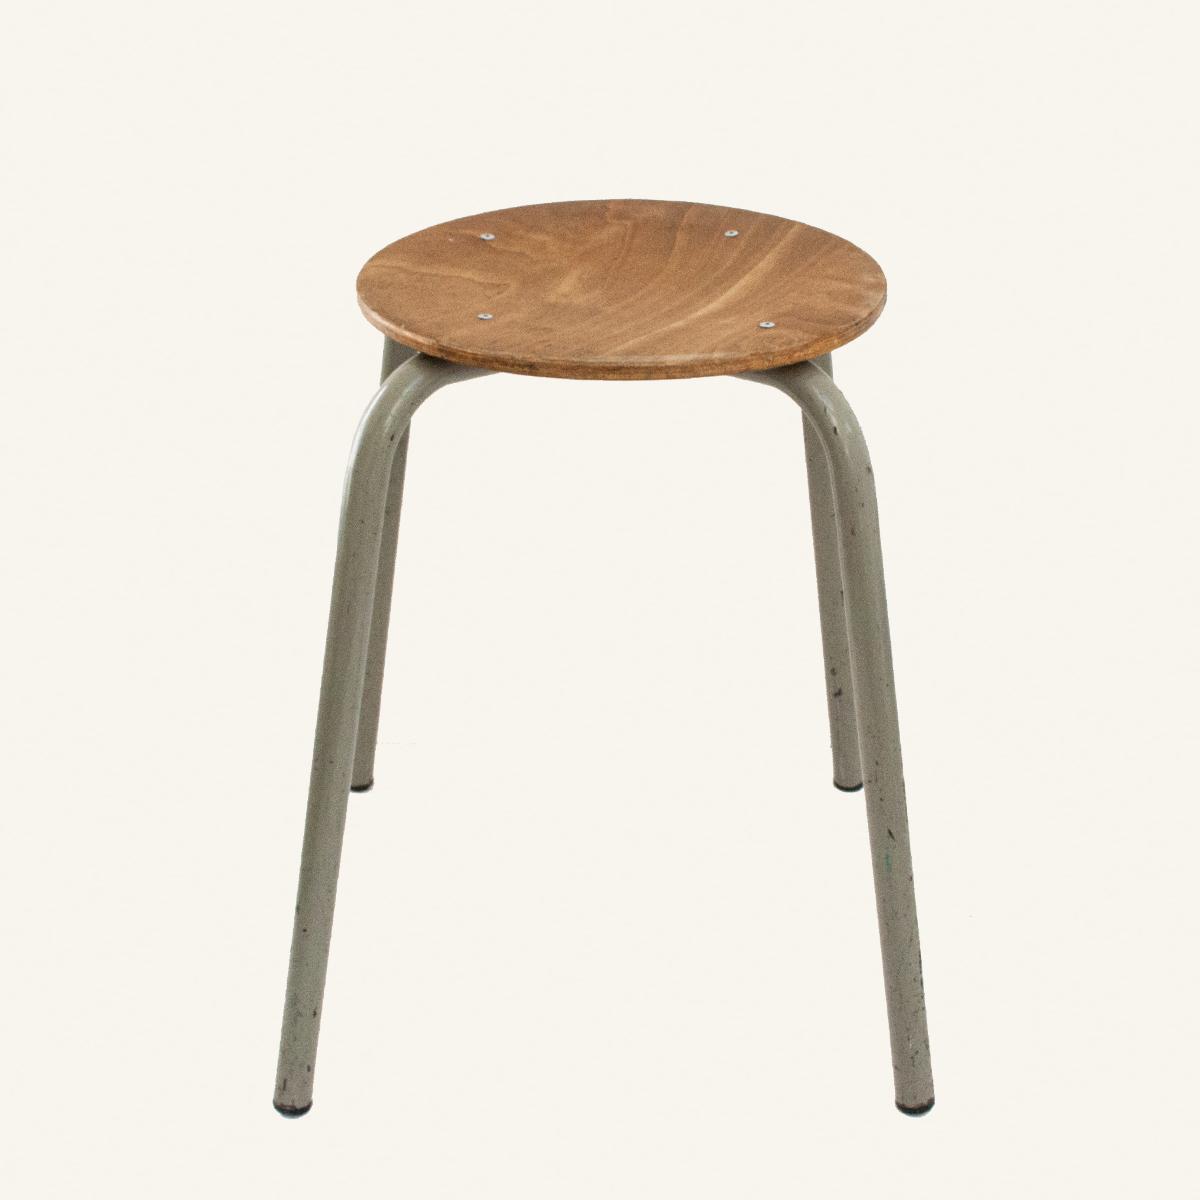 Wondrous Set Of 2 Vintage Stacking Stools Theyellowbook Wood Chair Design Ideas Theyellowbookinfo